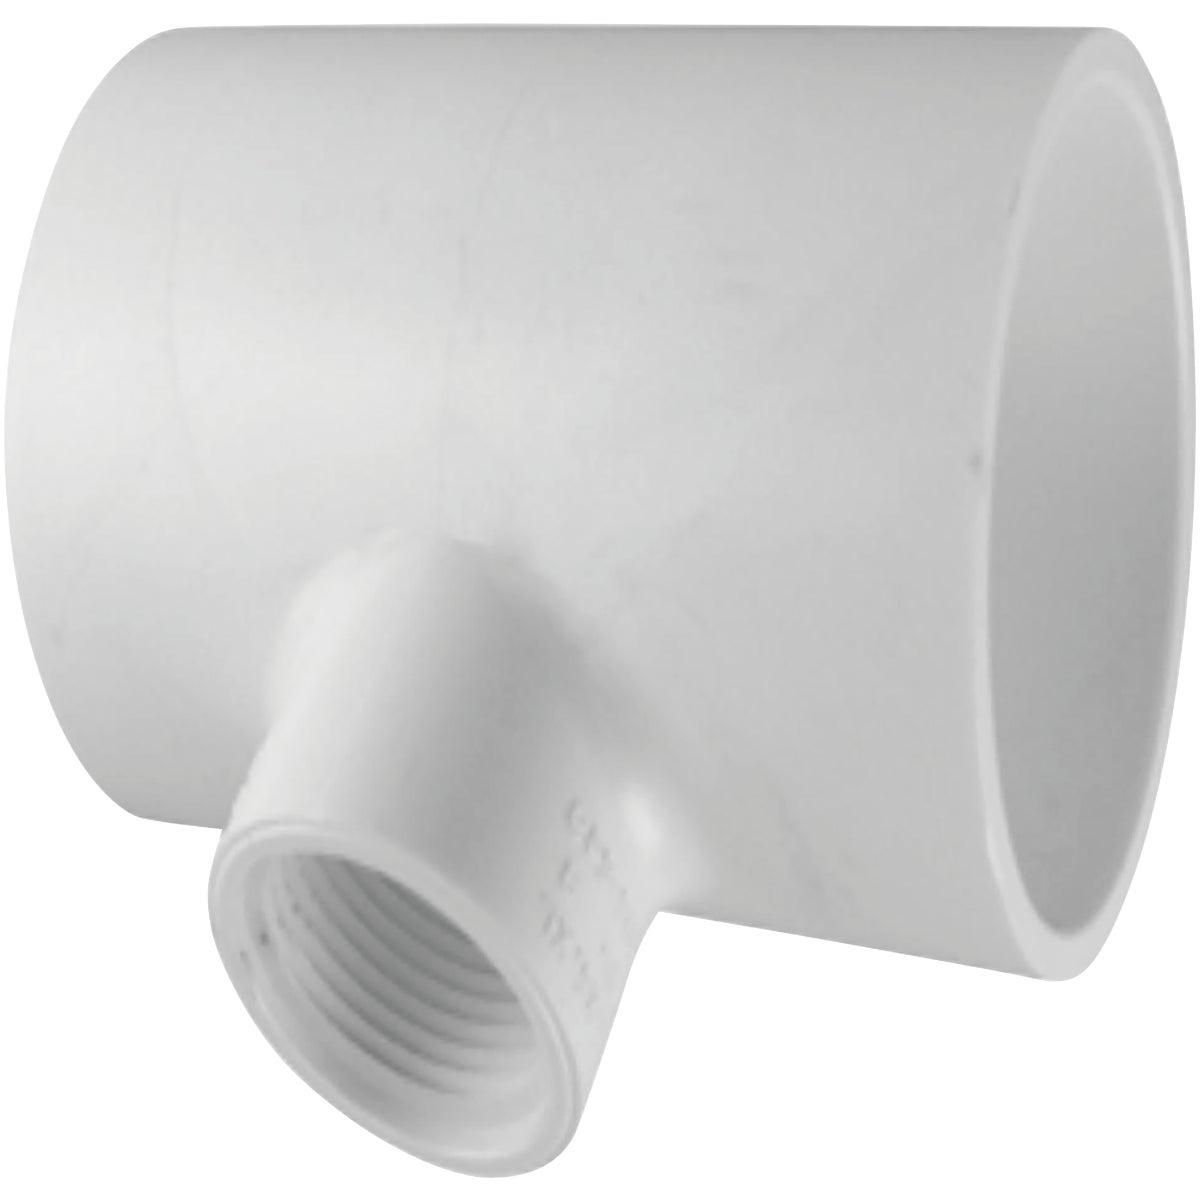 1X1/2 PVC SXFIP TEE - 31485 by Genova Inc